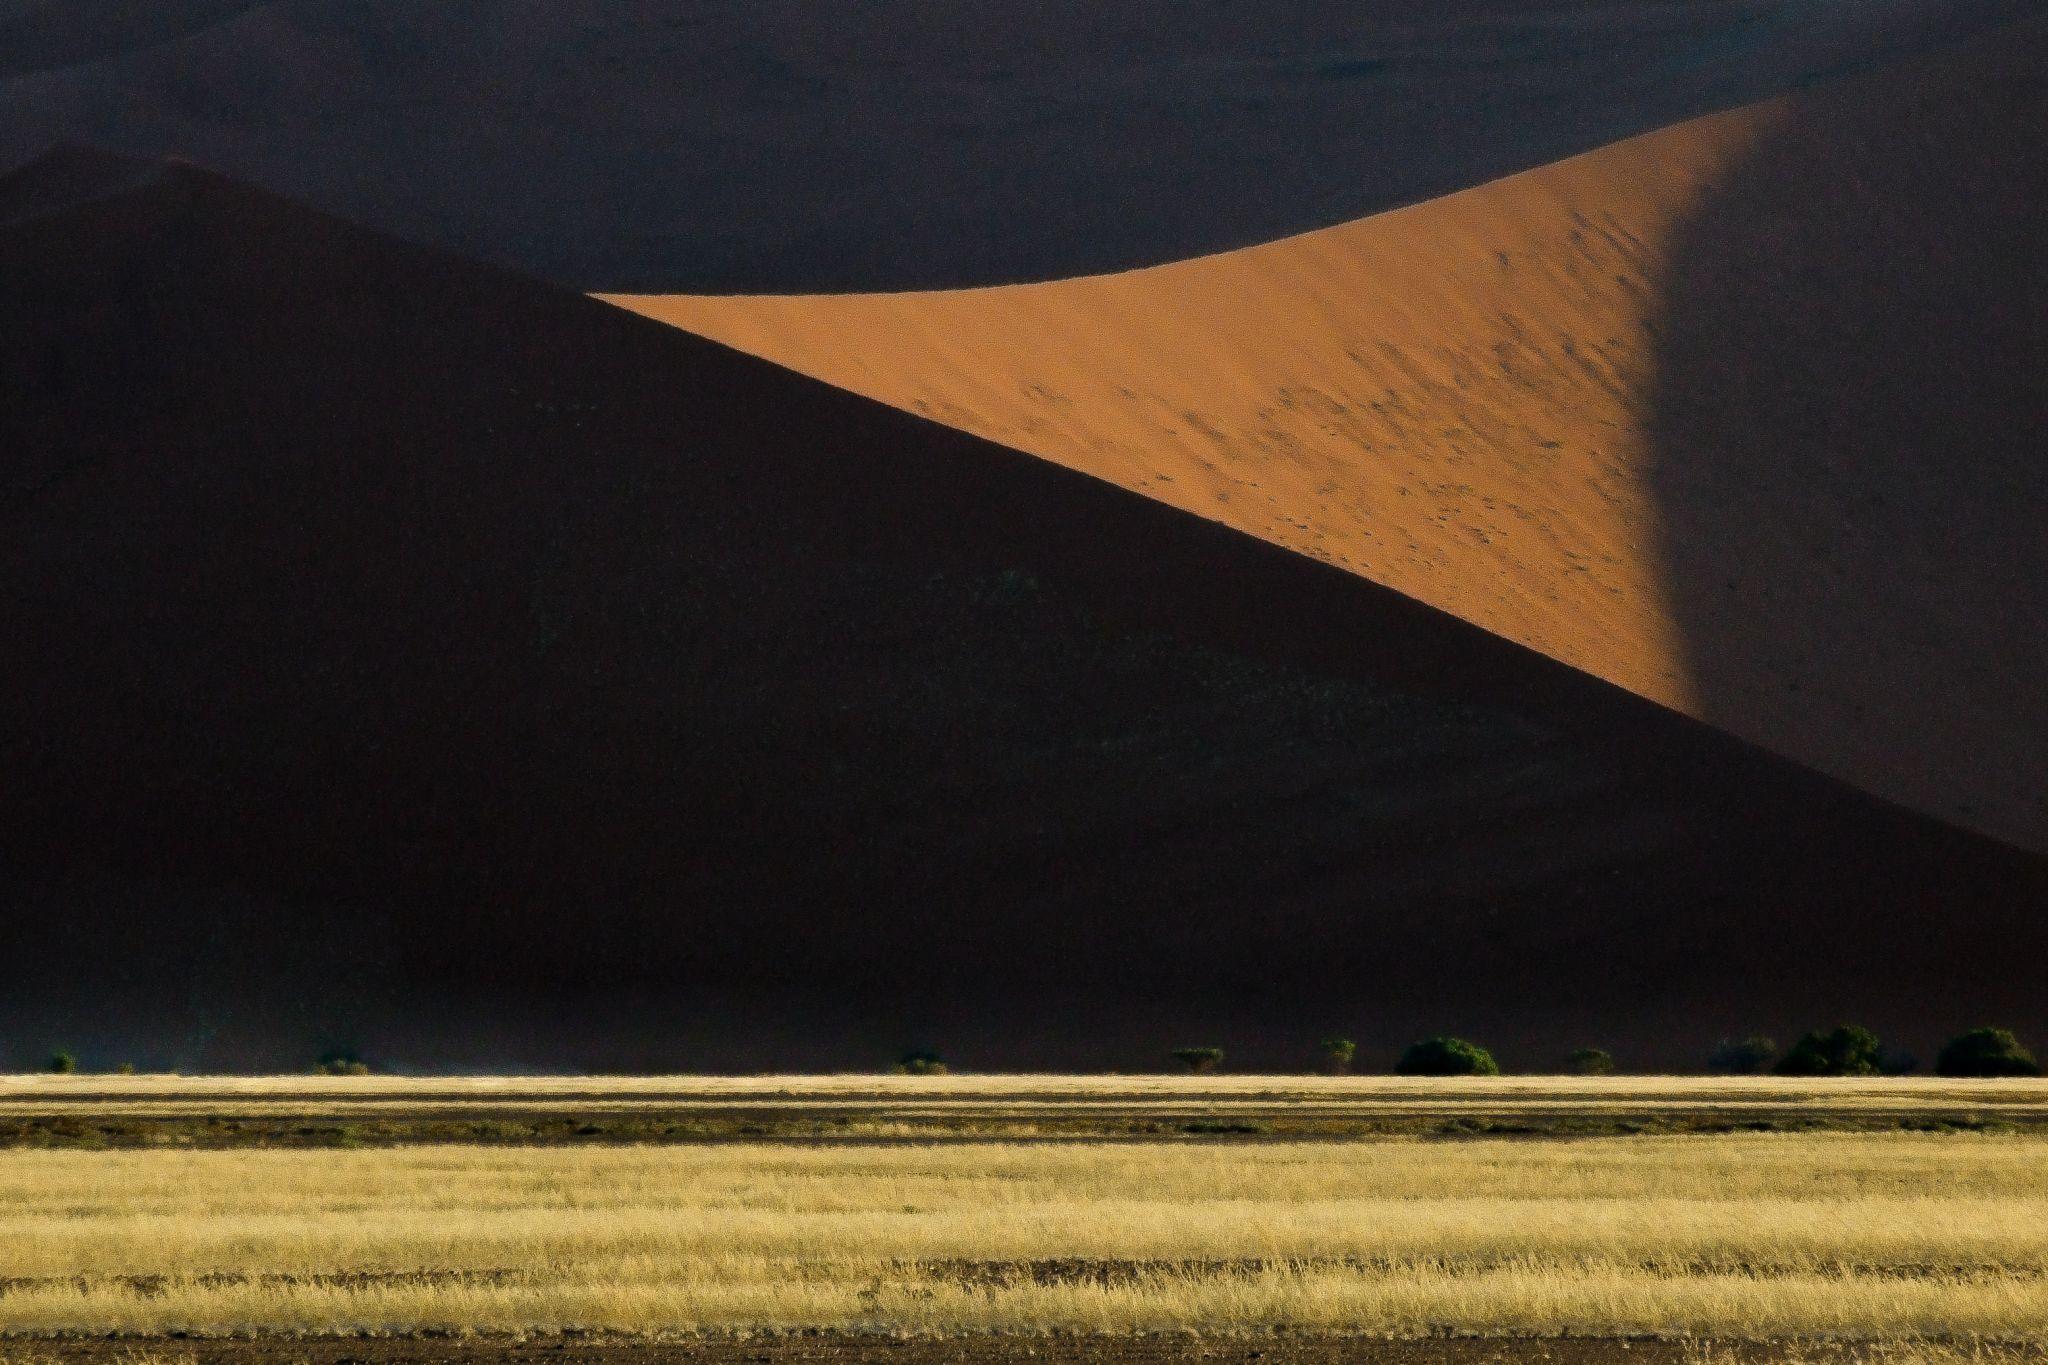 Near Sossusvlei, Namibia